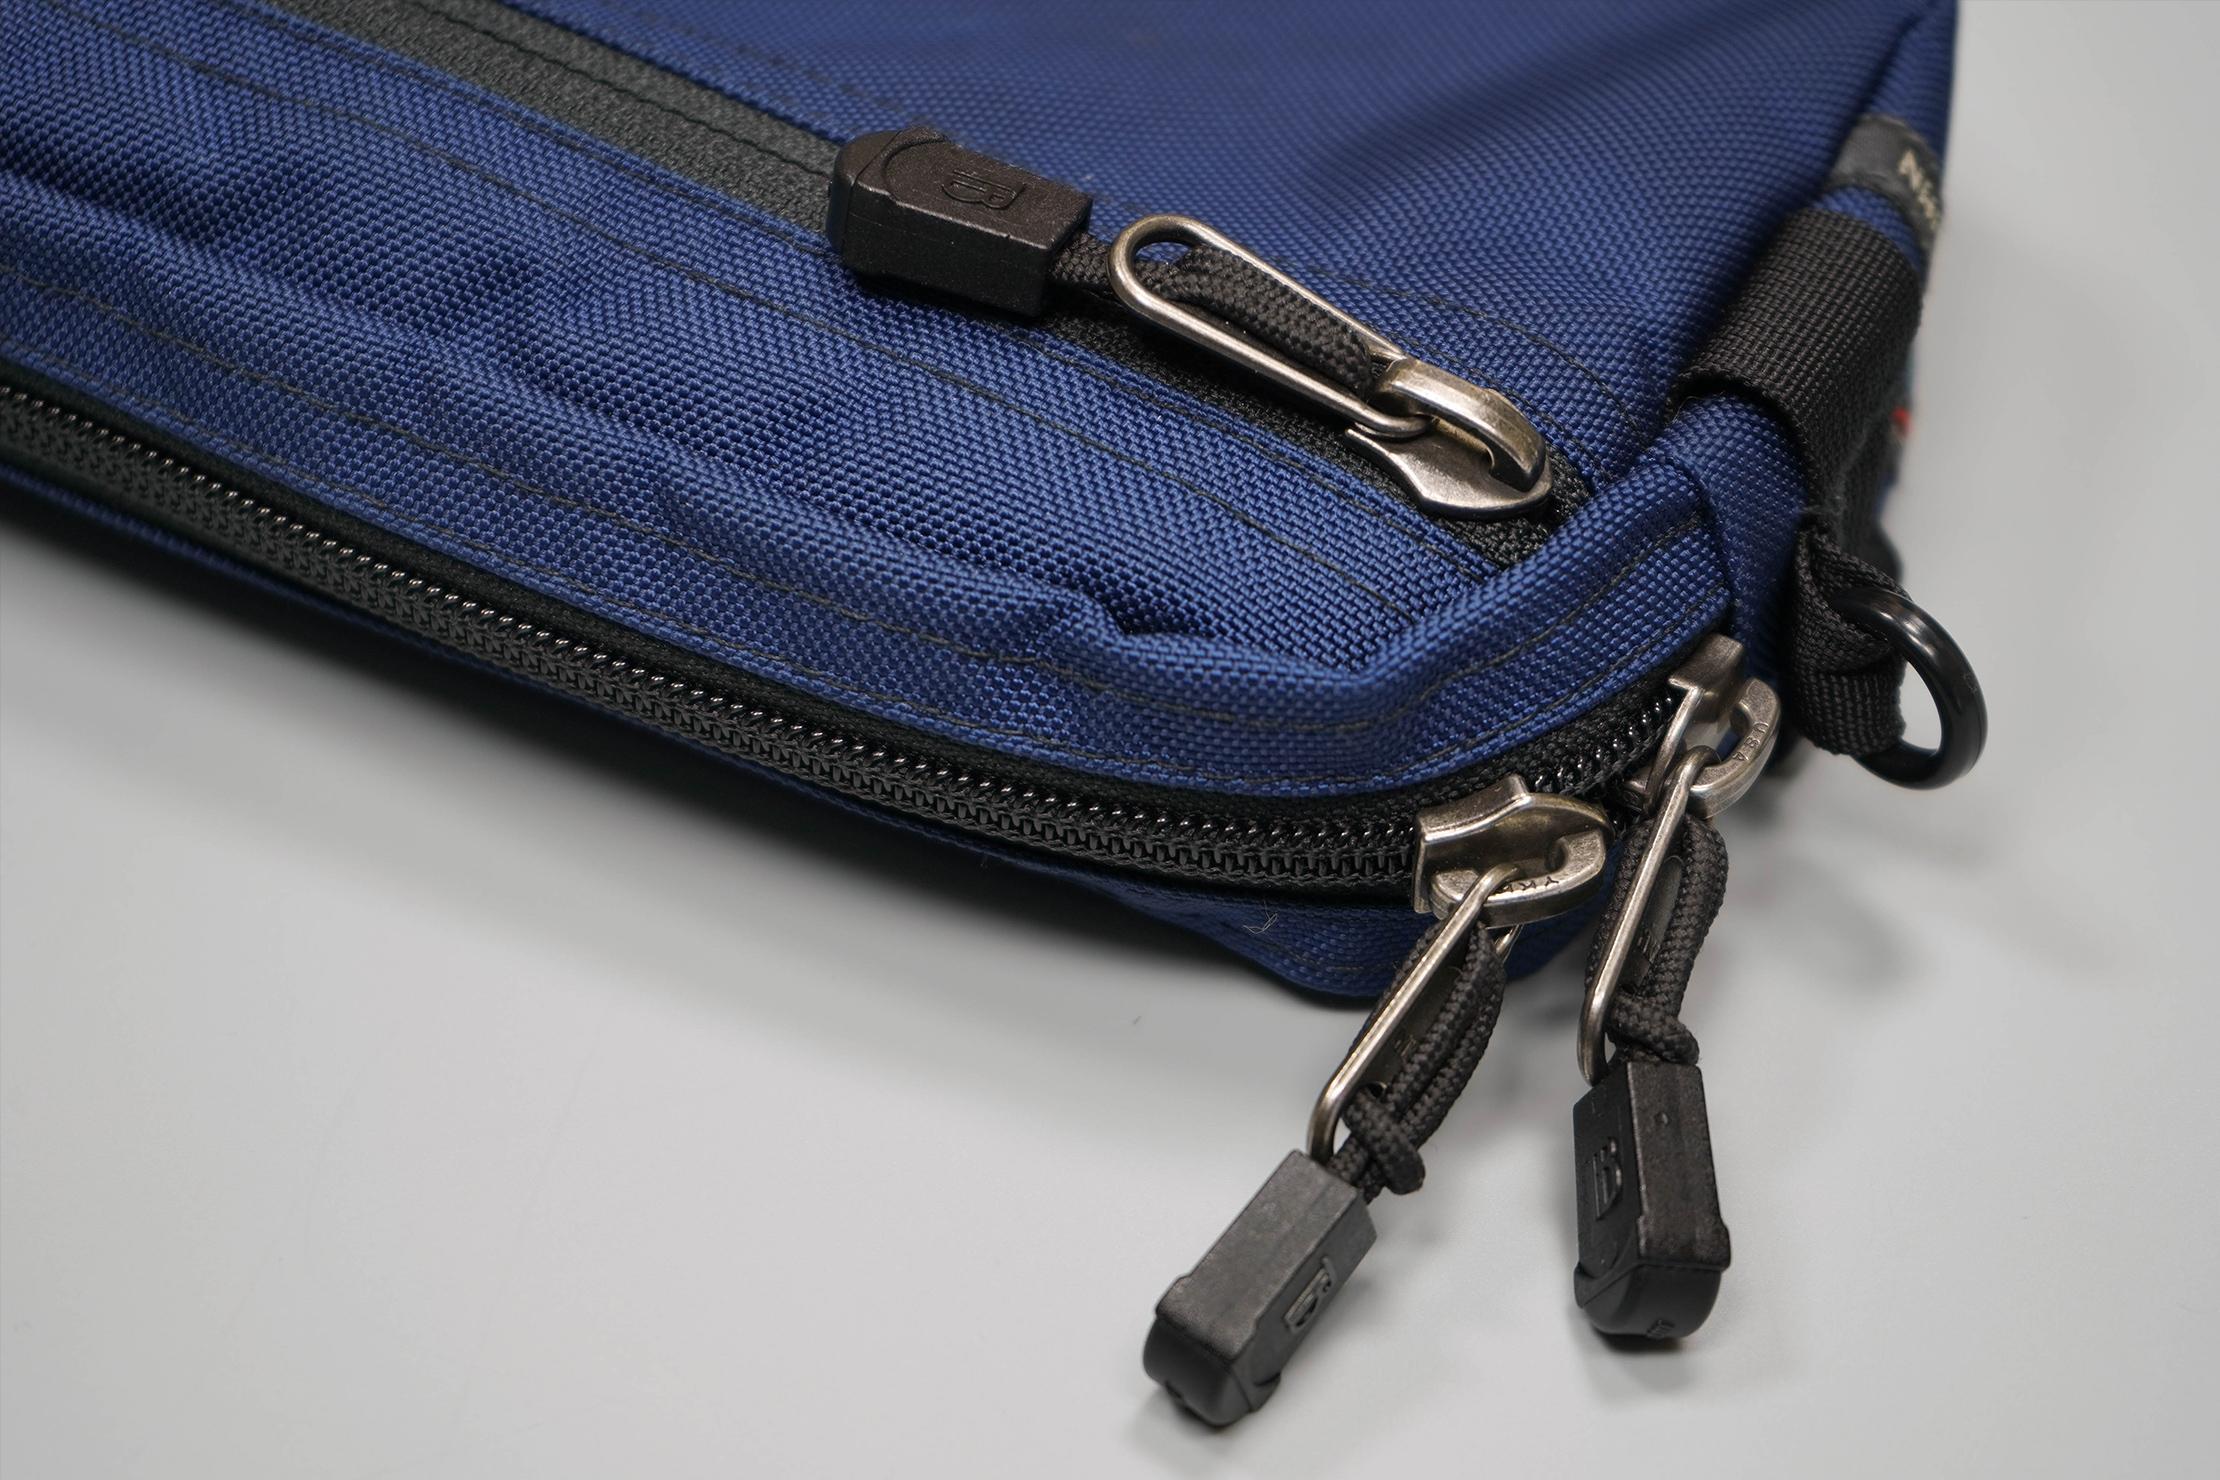 Tom Bihn Side Effect Zippers